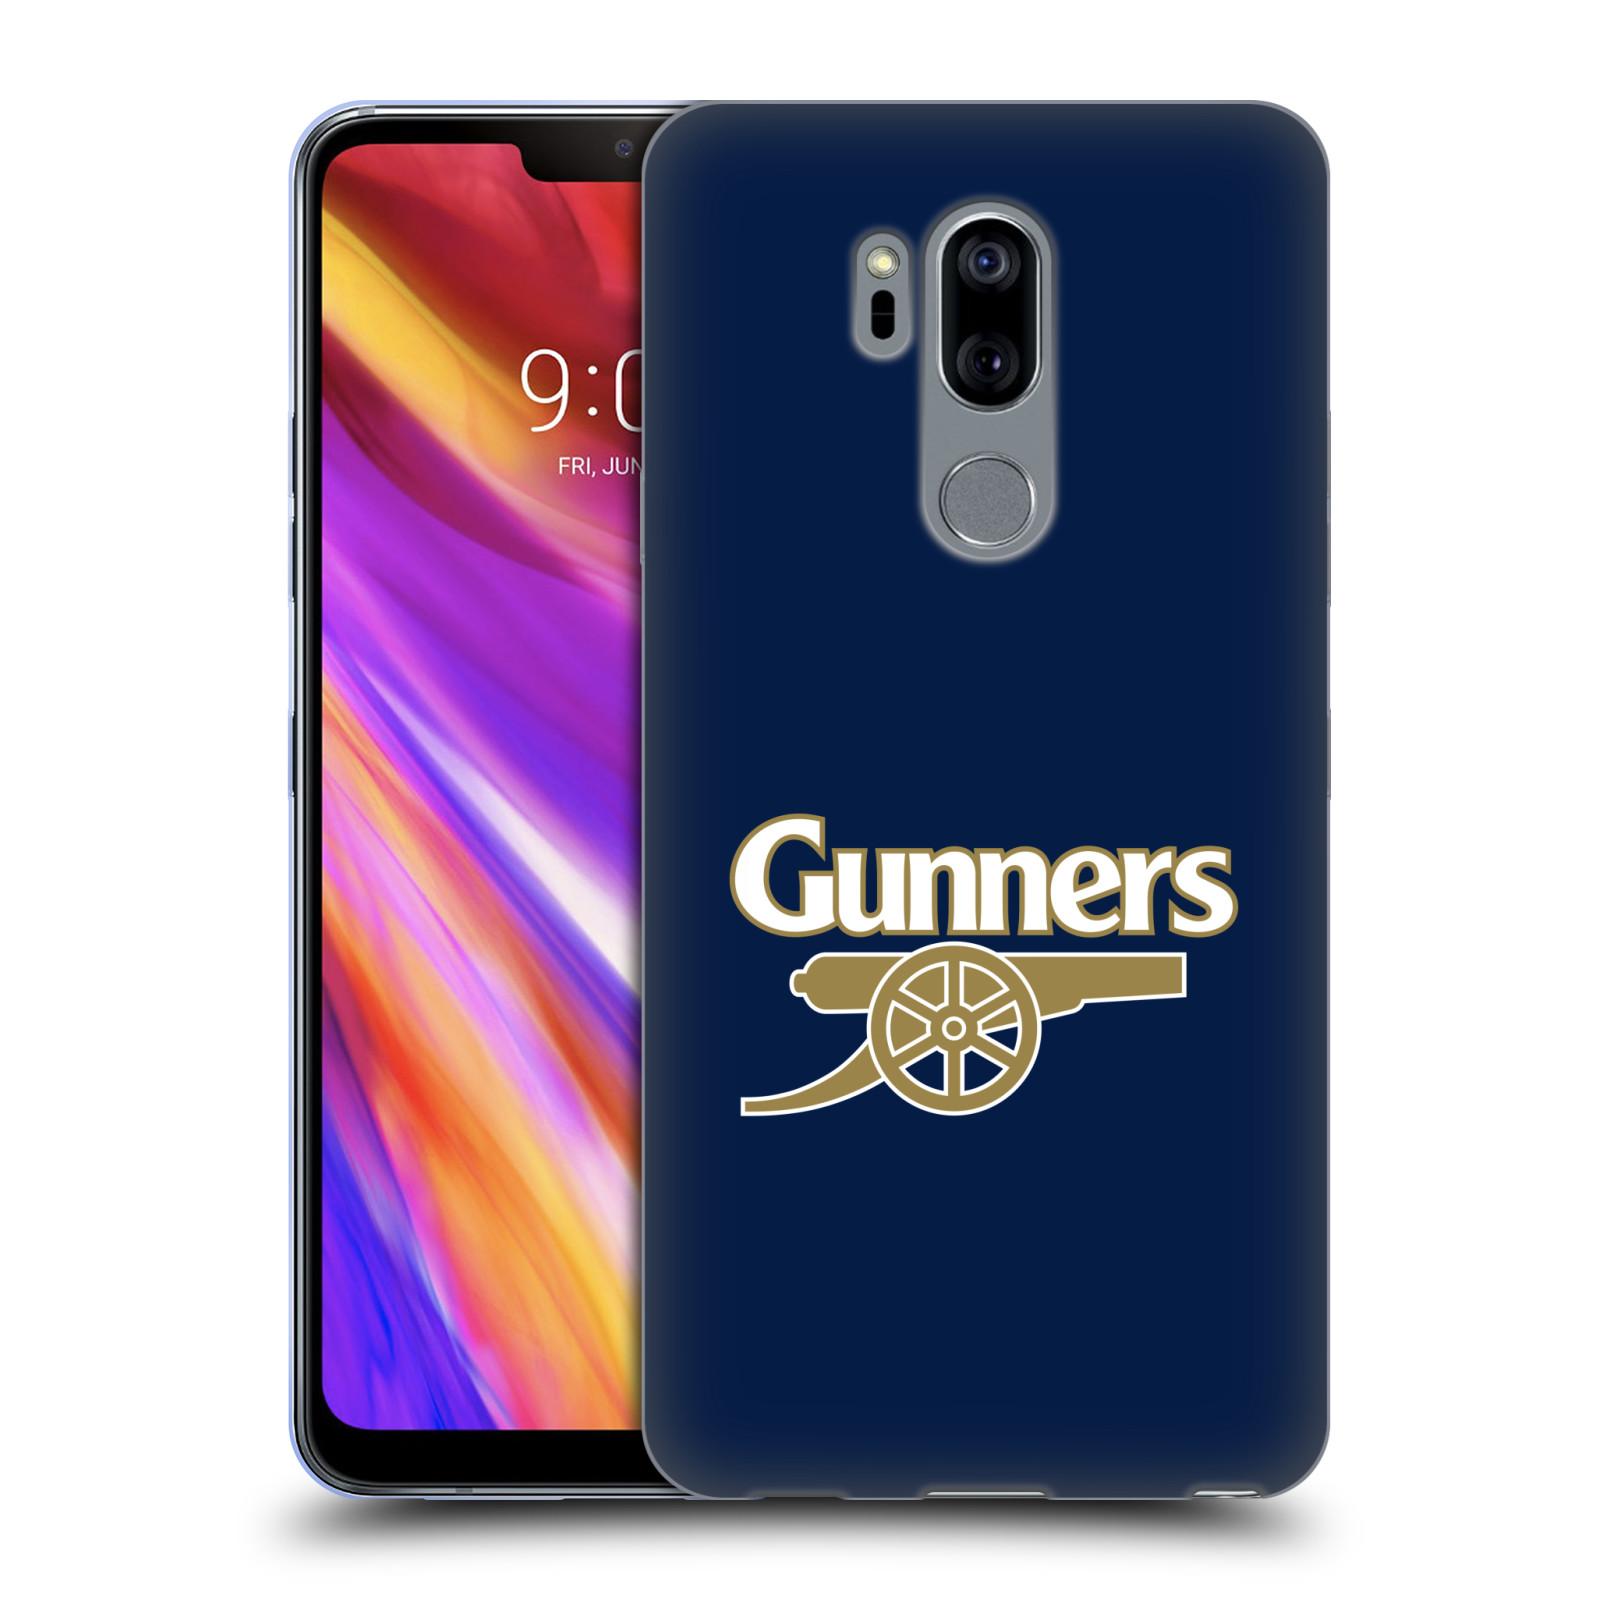 Silikonové pouzdro na mobil LG G7 ThinQ - Head Case - Arsenal FC - Gunners